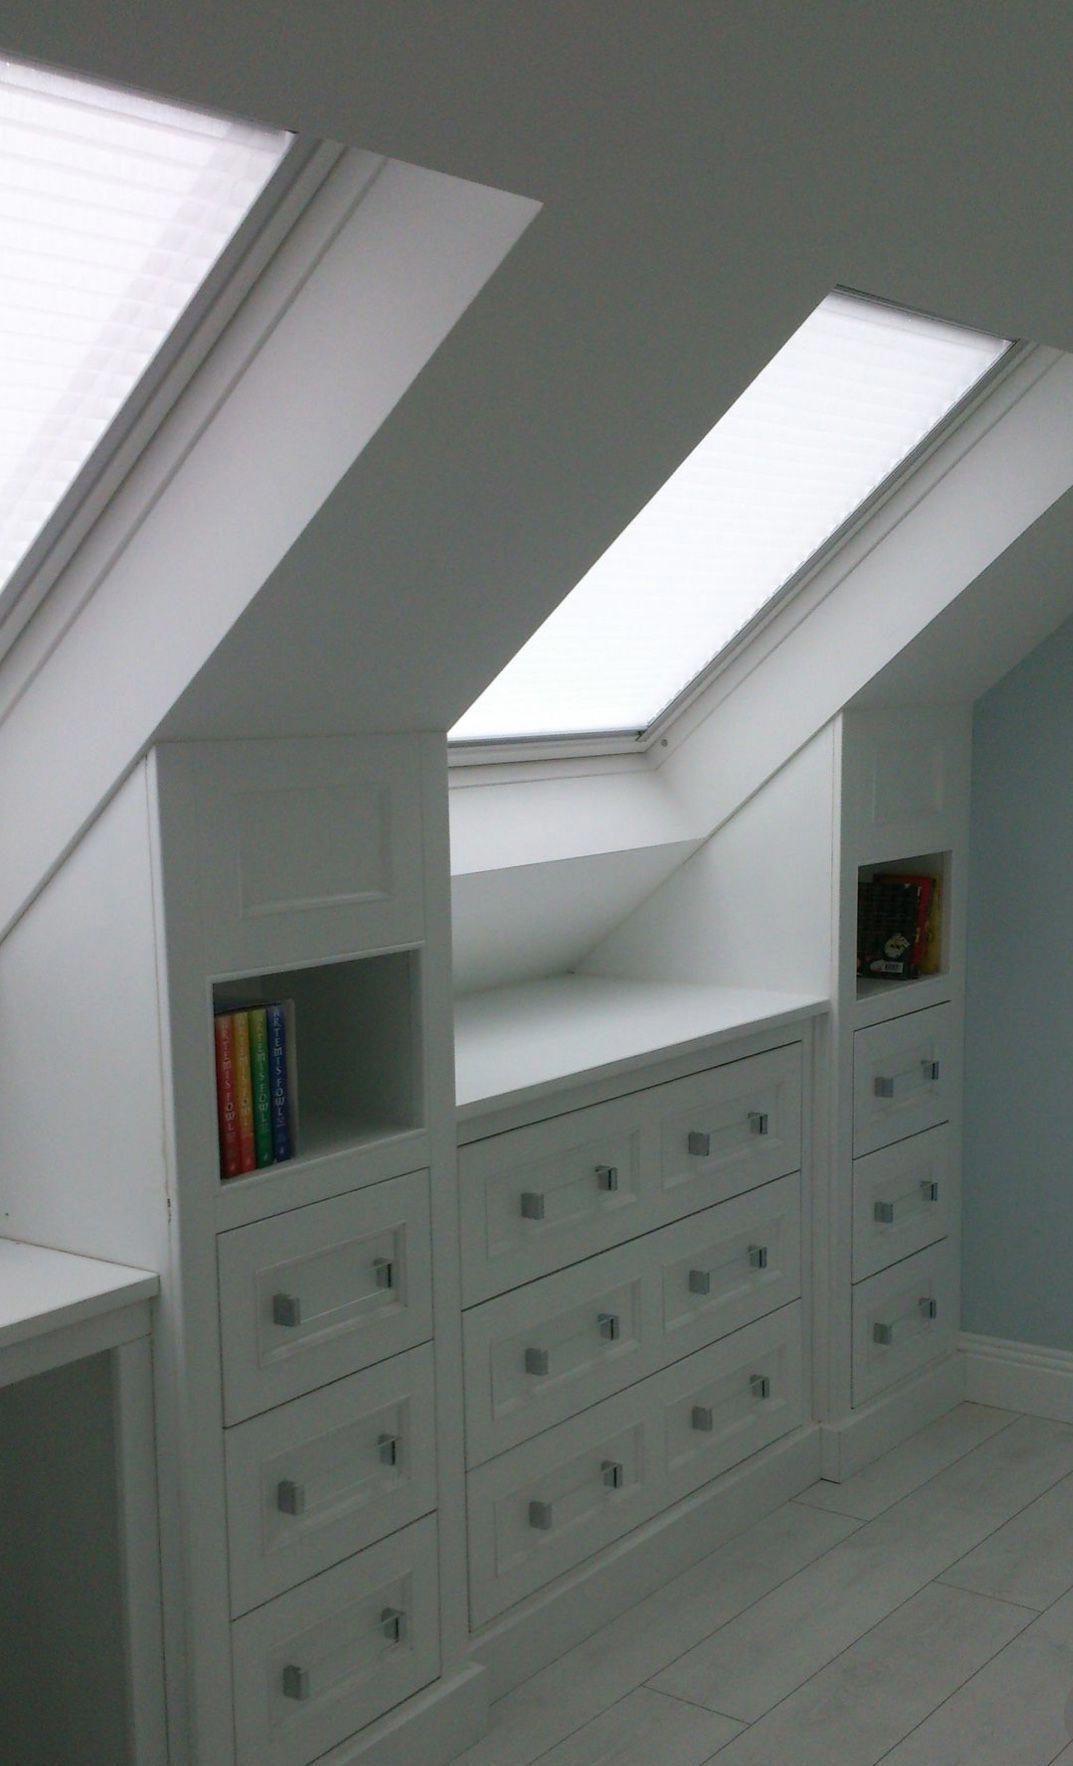 Attic Room Ideas Slanted Walls Bedrooms Small Attic Room Ideas